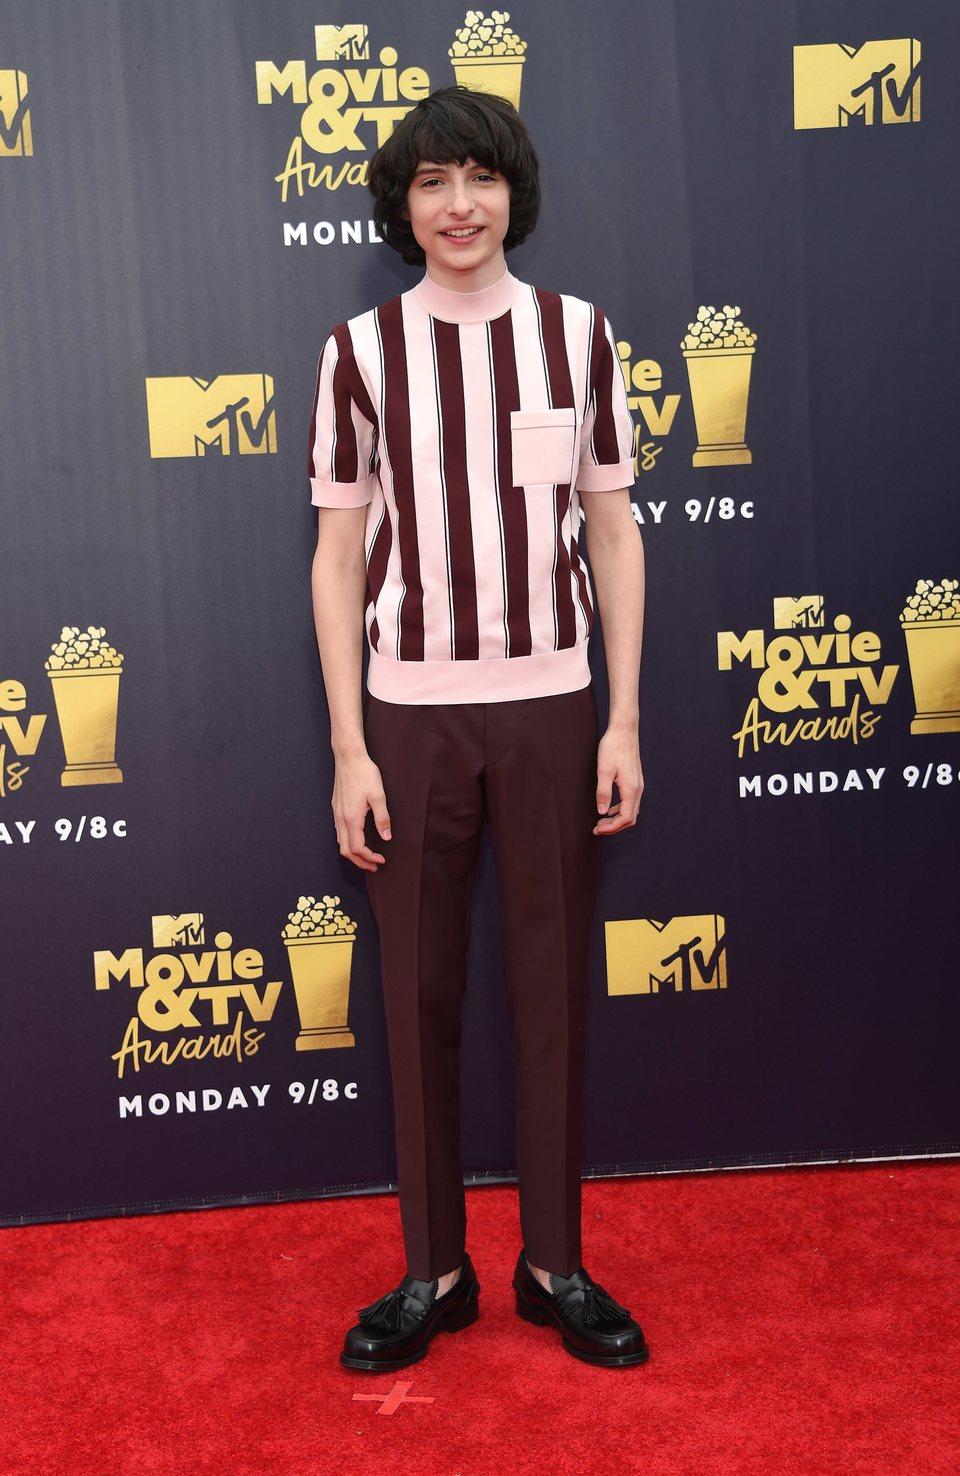 Finn Wolfhard en la alfombra roja de los MTV Movie & TV Awards 2018